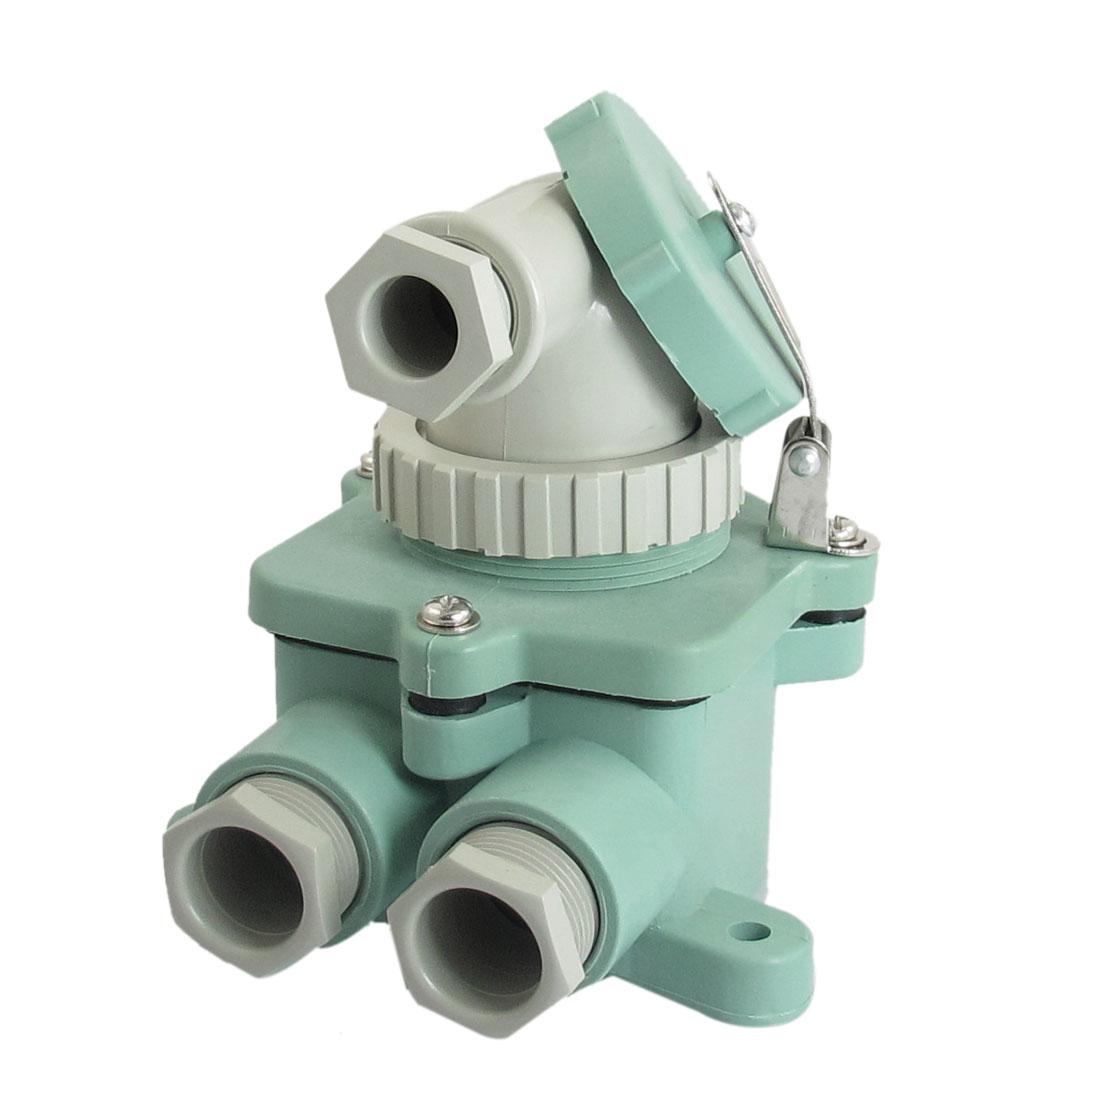 AC 250V 20A 2 Pole Water Resistant Marine Connector Socket Set Z-M/T-MB